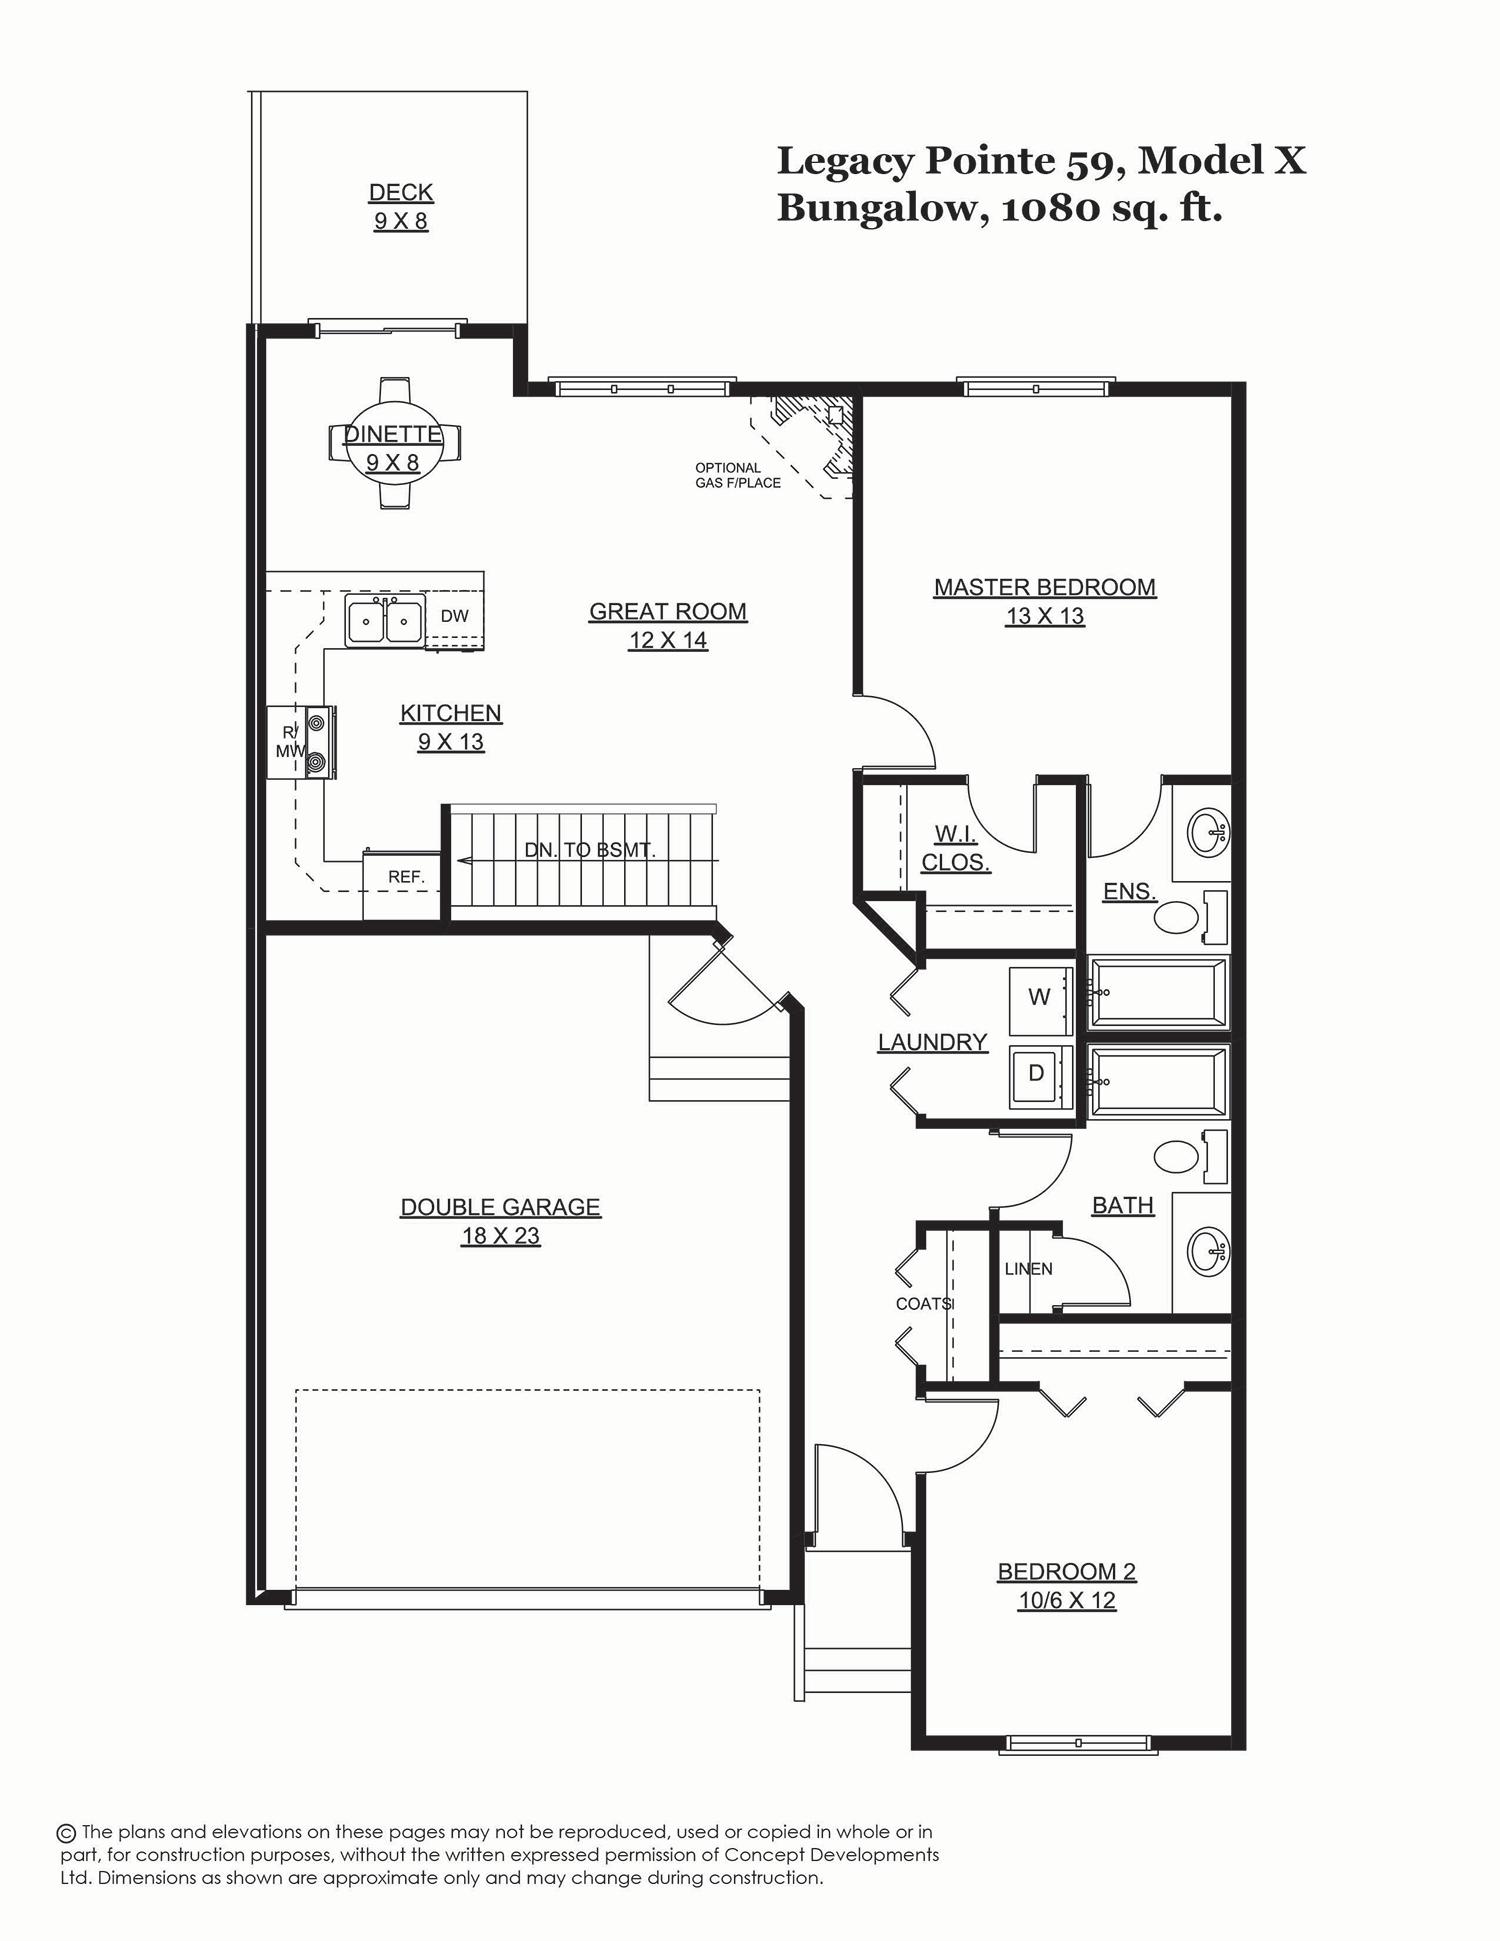 Legacy Pointe 59 - 1080 sq. ft.